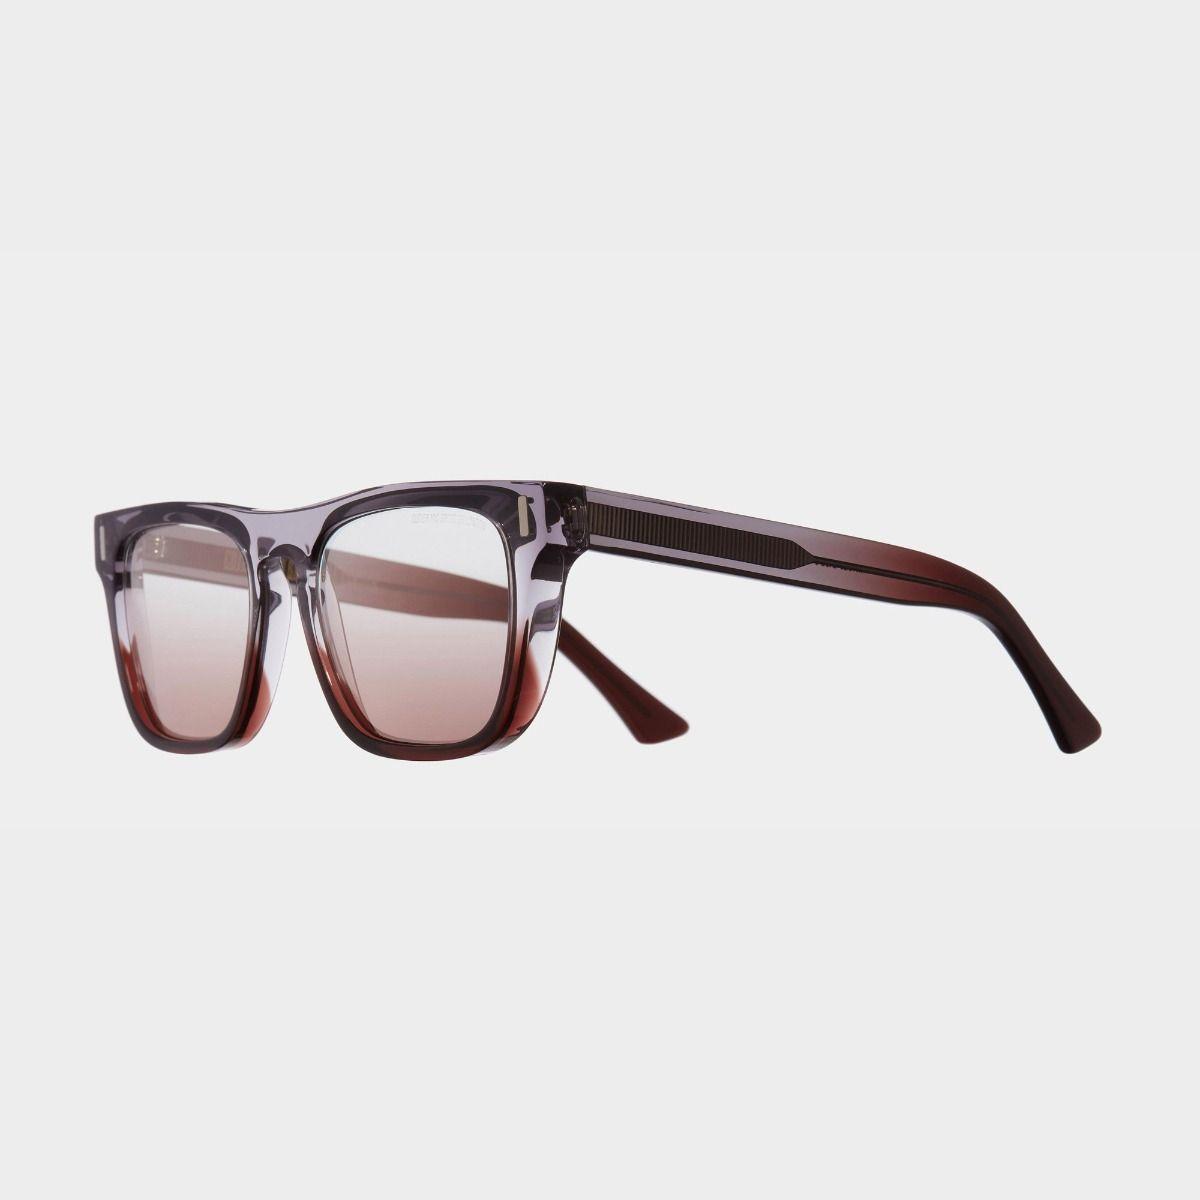 1320 D-Frame Sunglasses